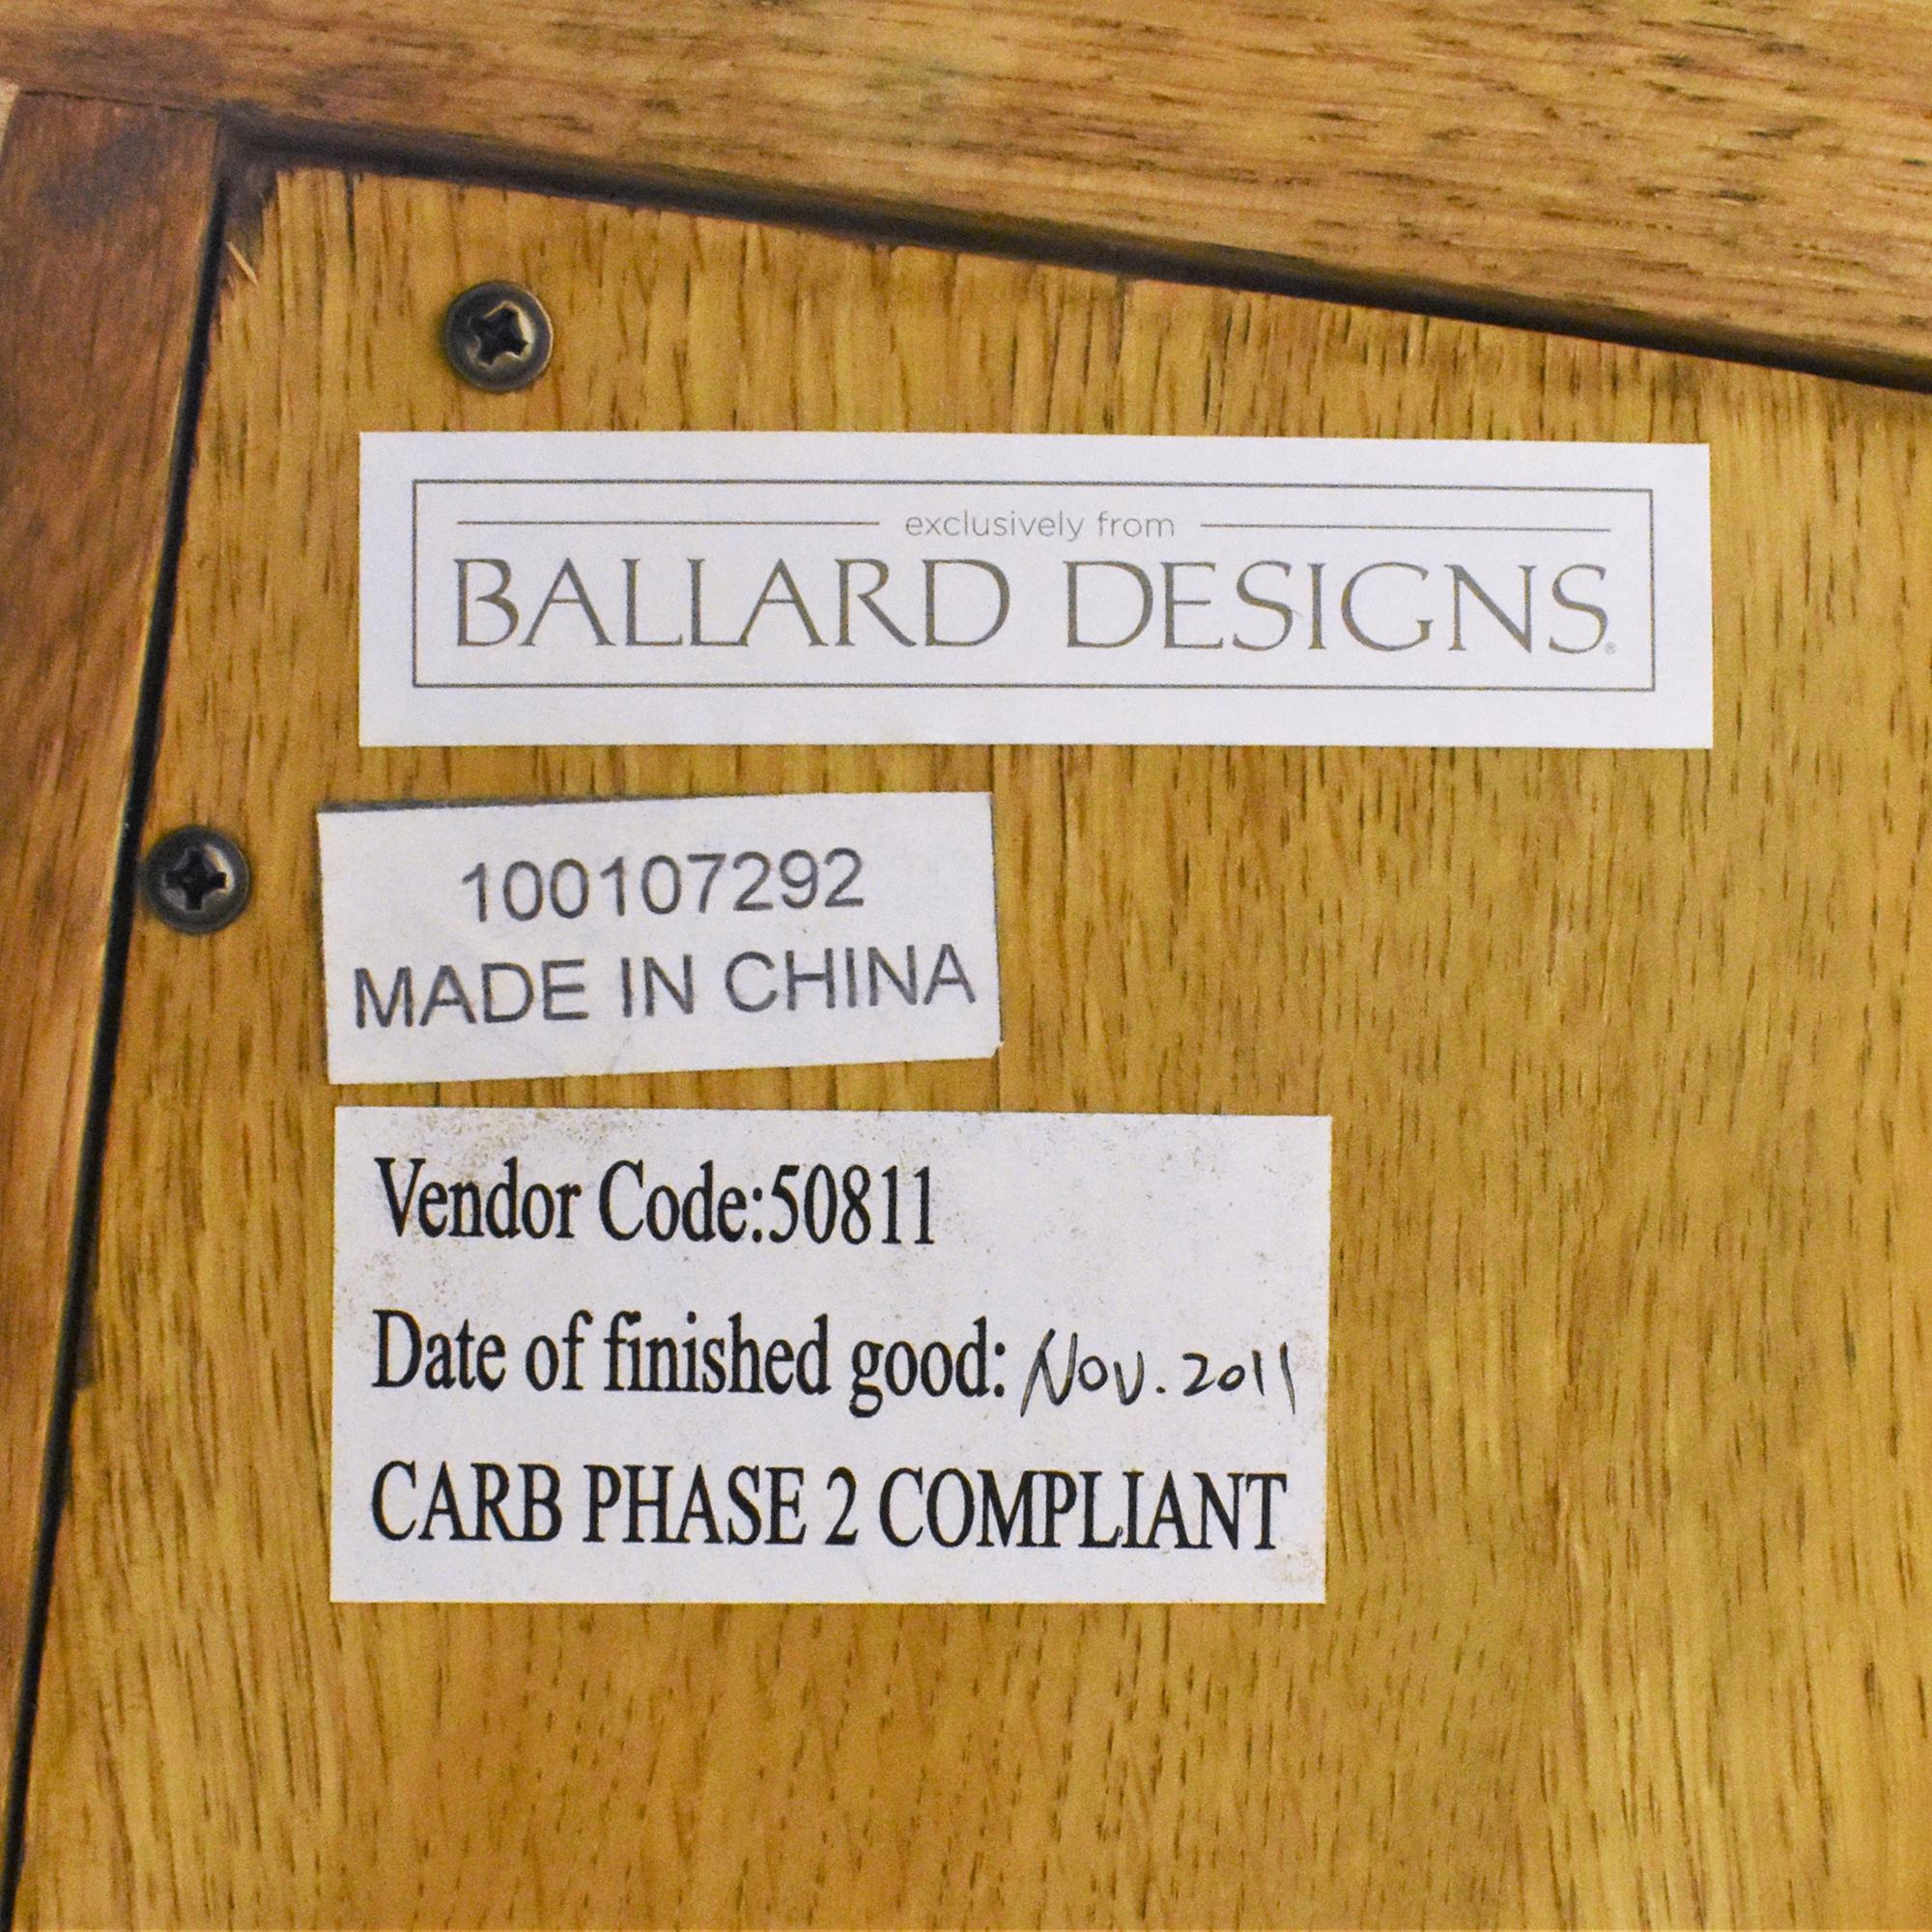 Ballard Designs Belgard Console Ballard Designs